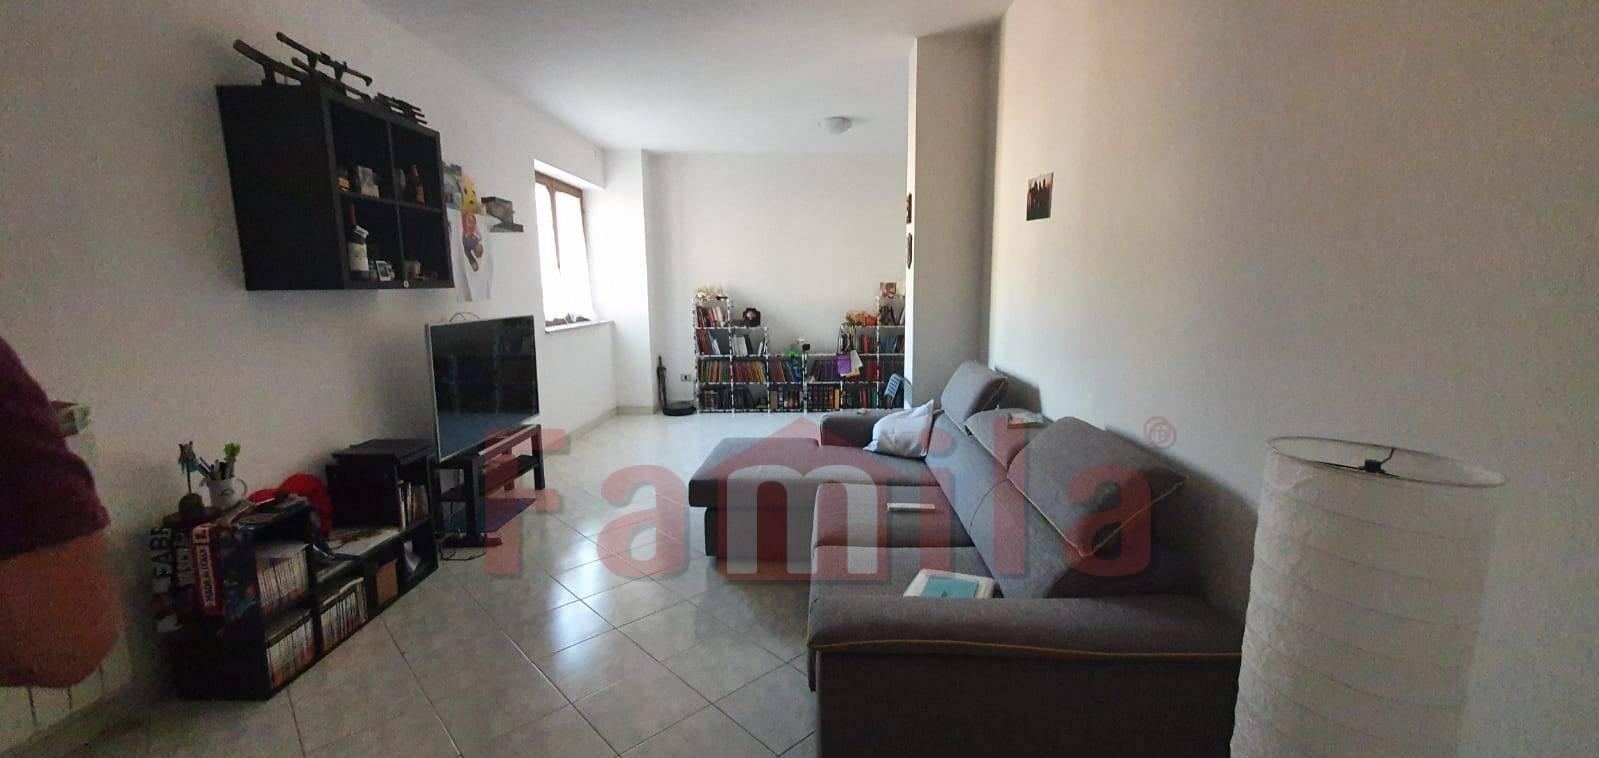 Appartamento in vendita a Sirignano (AV)